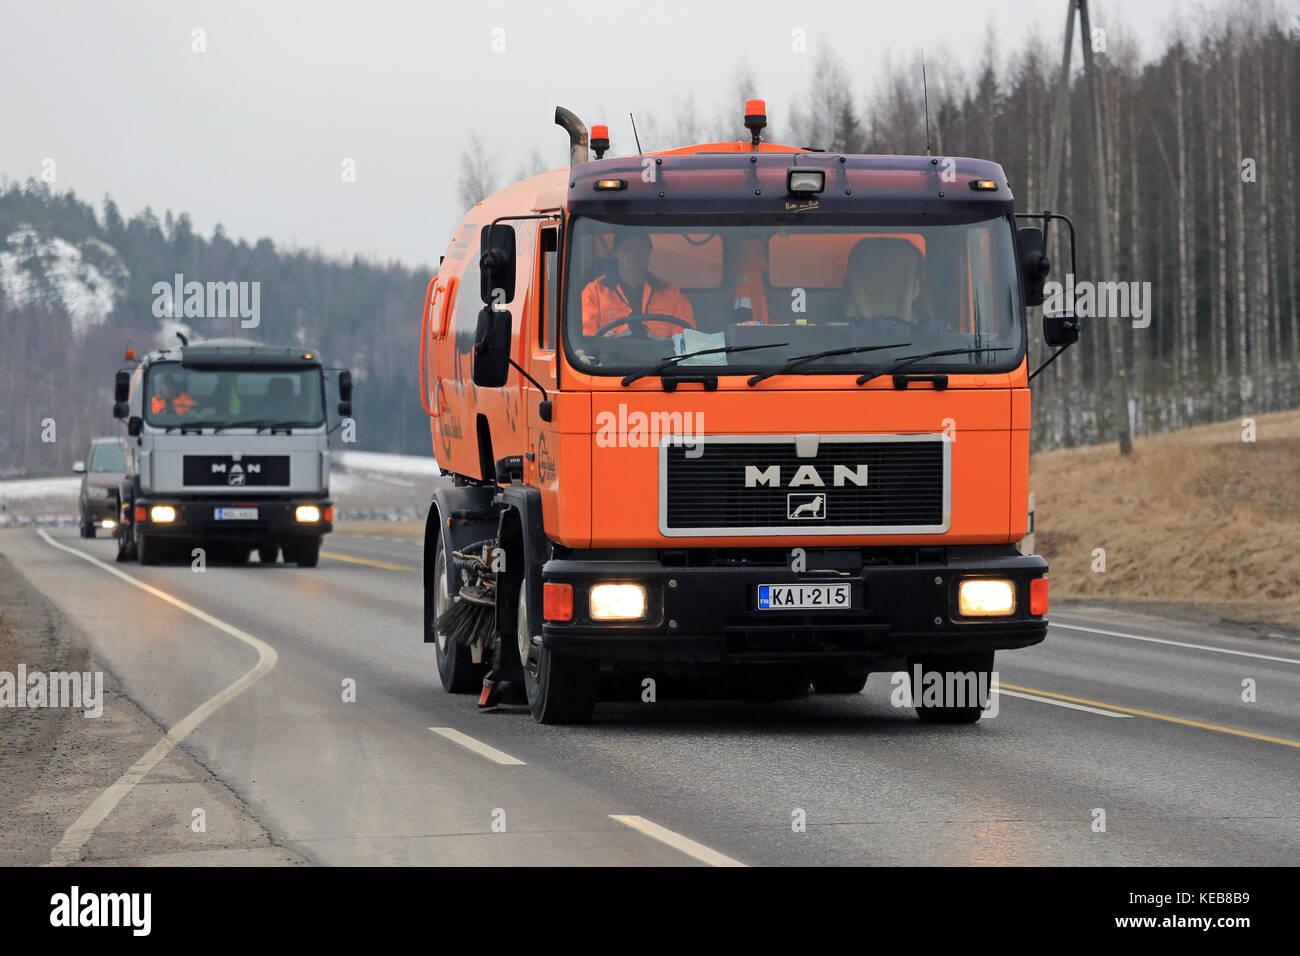 SALO, FINLAND - MARCH 24, 2016: Two MAN Schorling Road Sweeper trucks drive along highway in Salo. Modern street Stock Photo